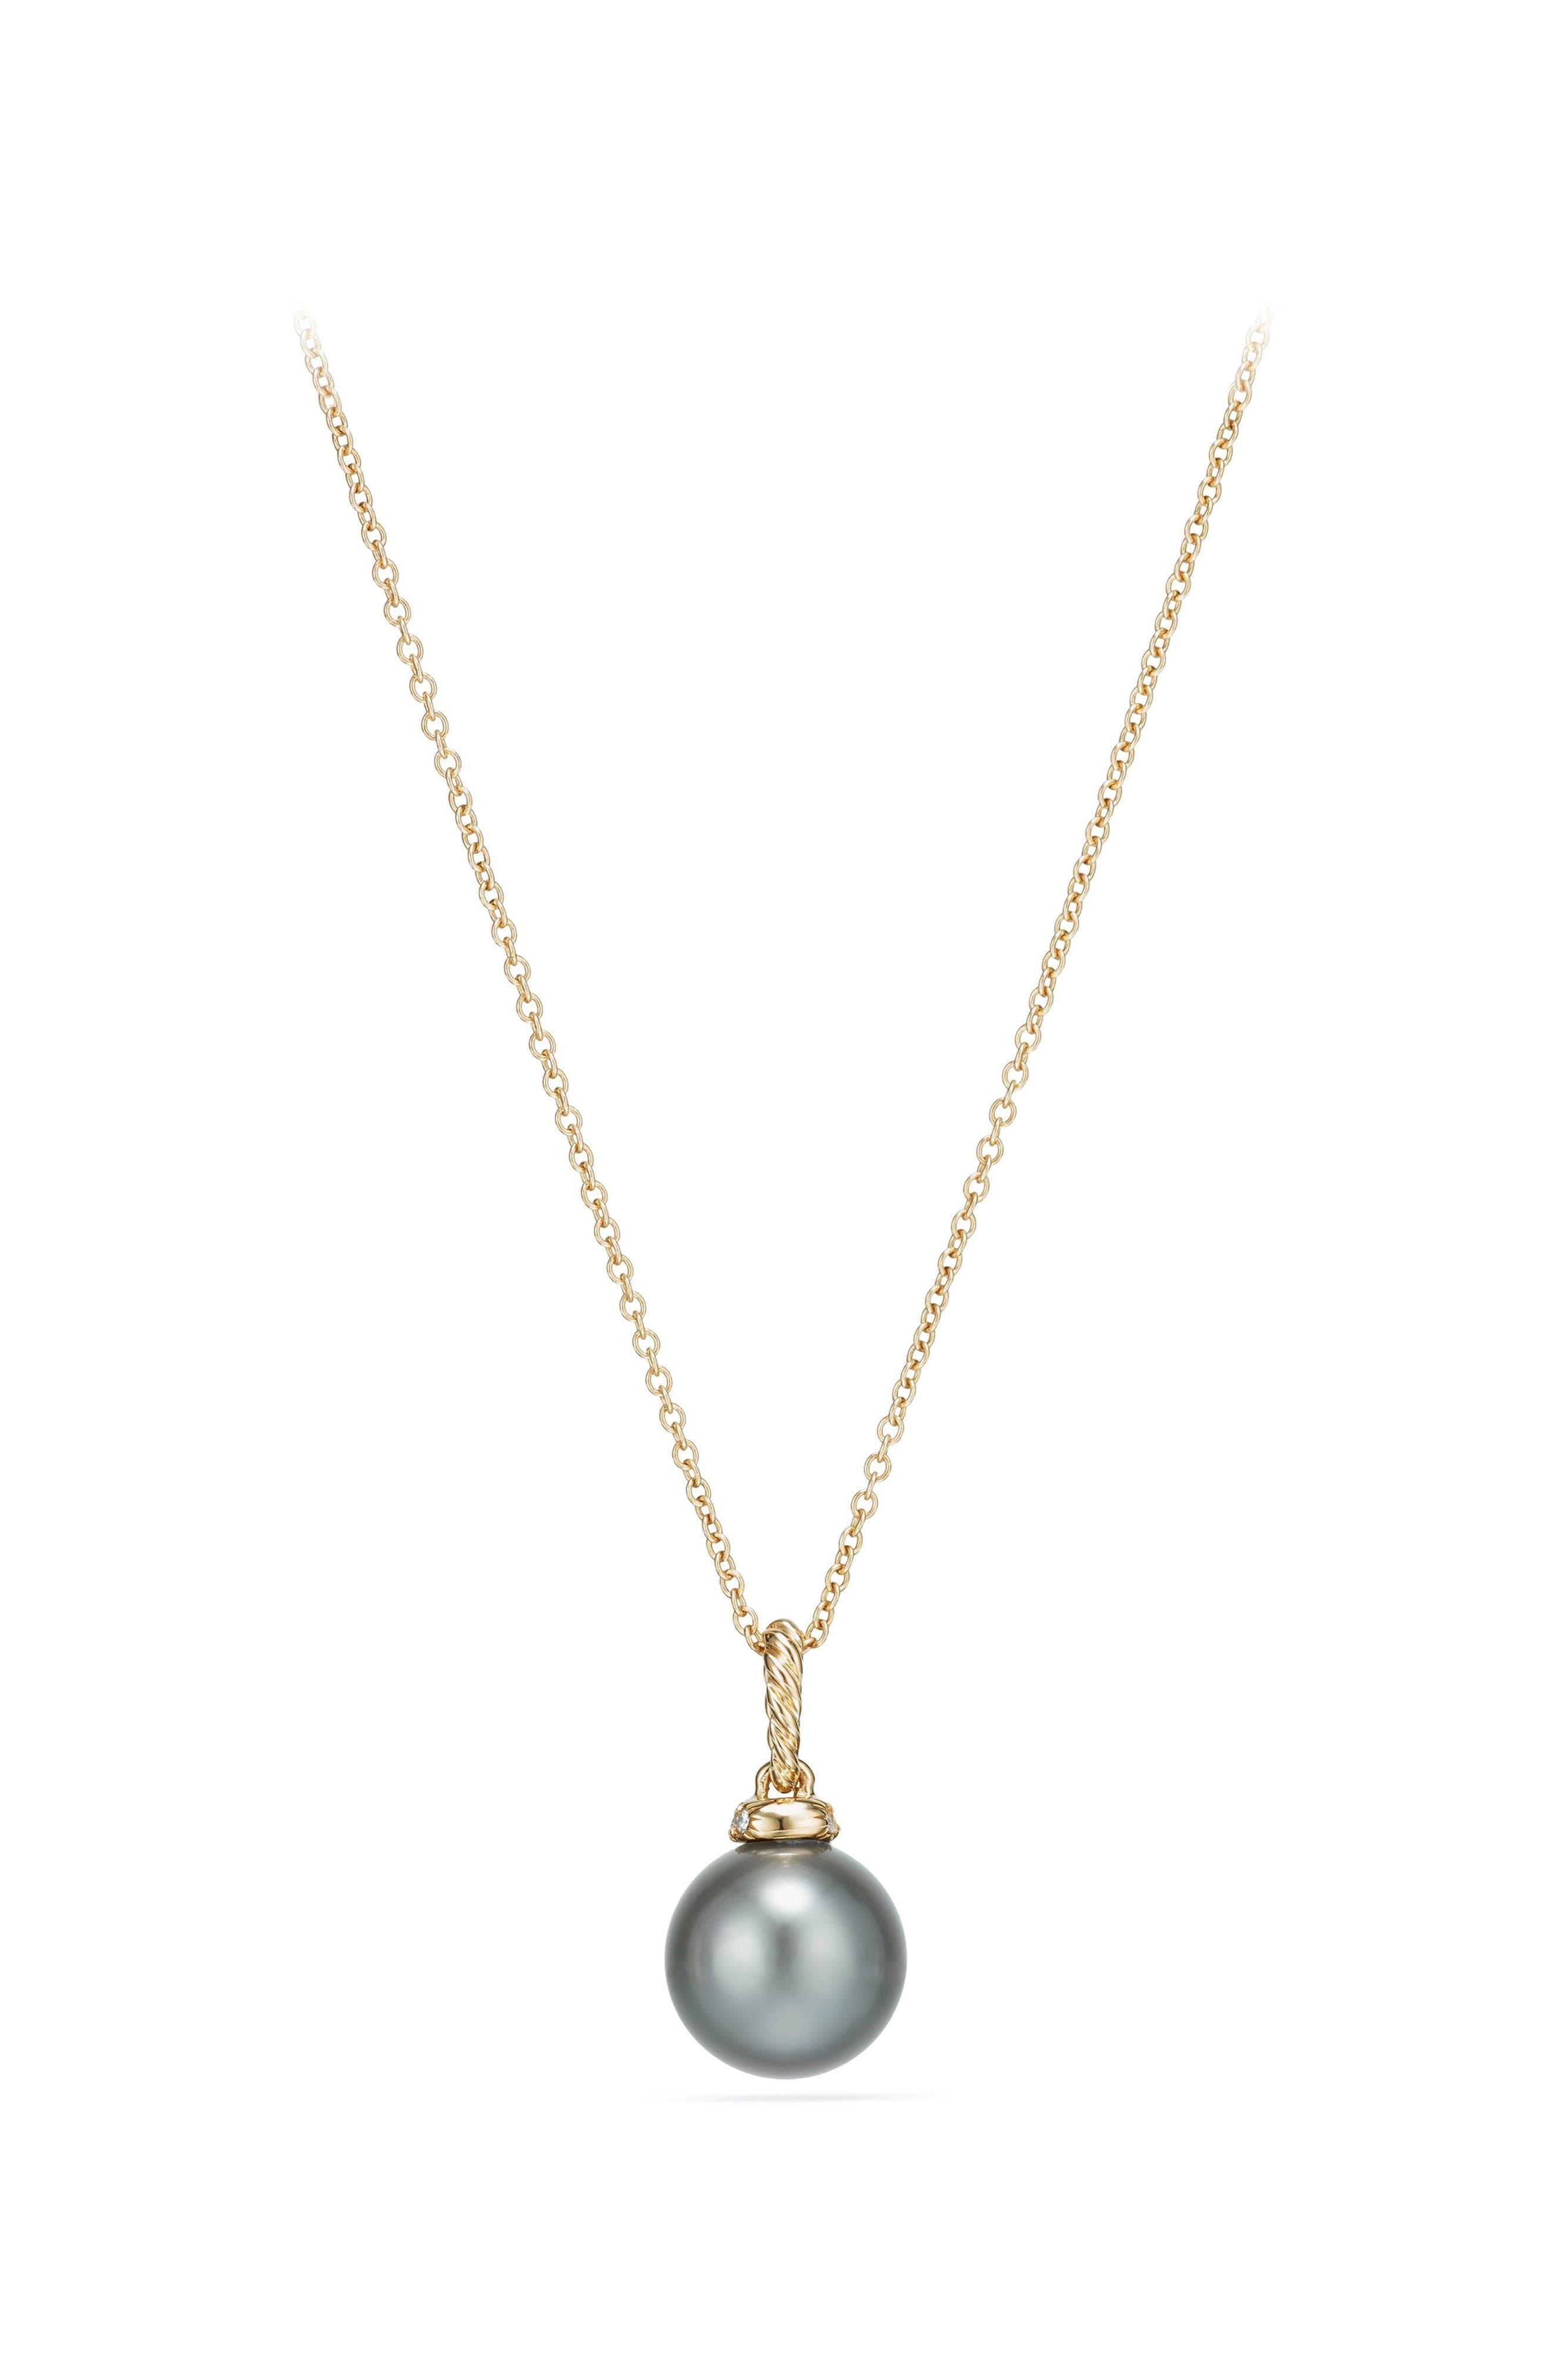 Solari Pendant Necklace with Diamonds,                             Alternate thumbnail 3, color,                             GOLD/ DIAMOND/ GREY PEARL